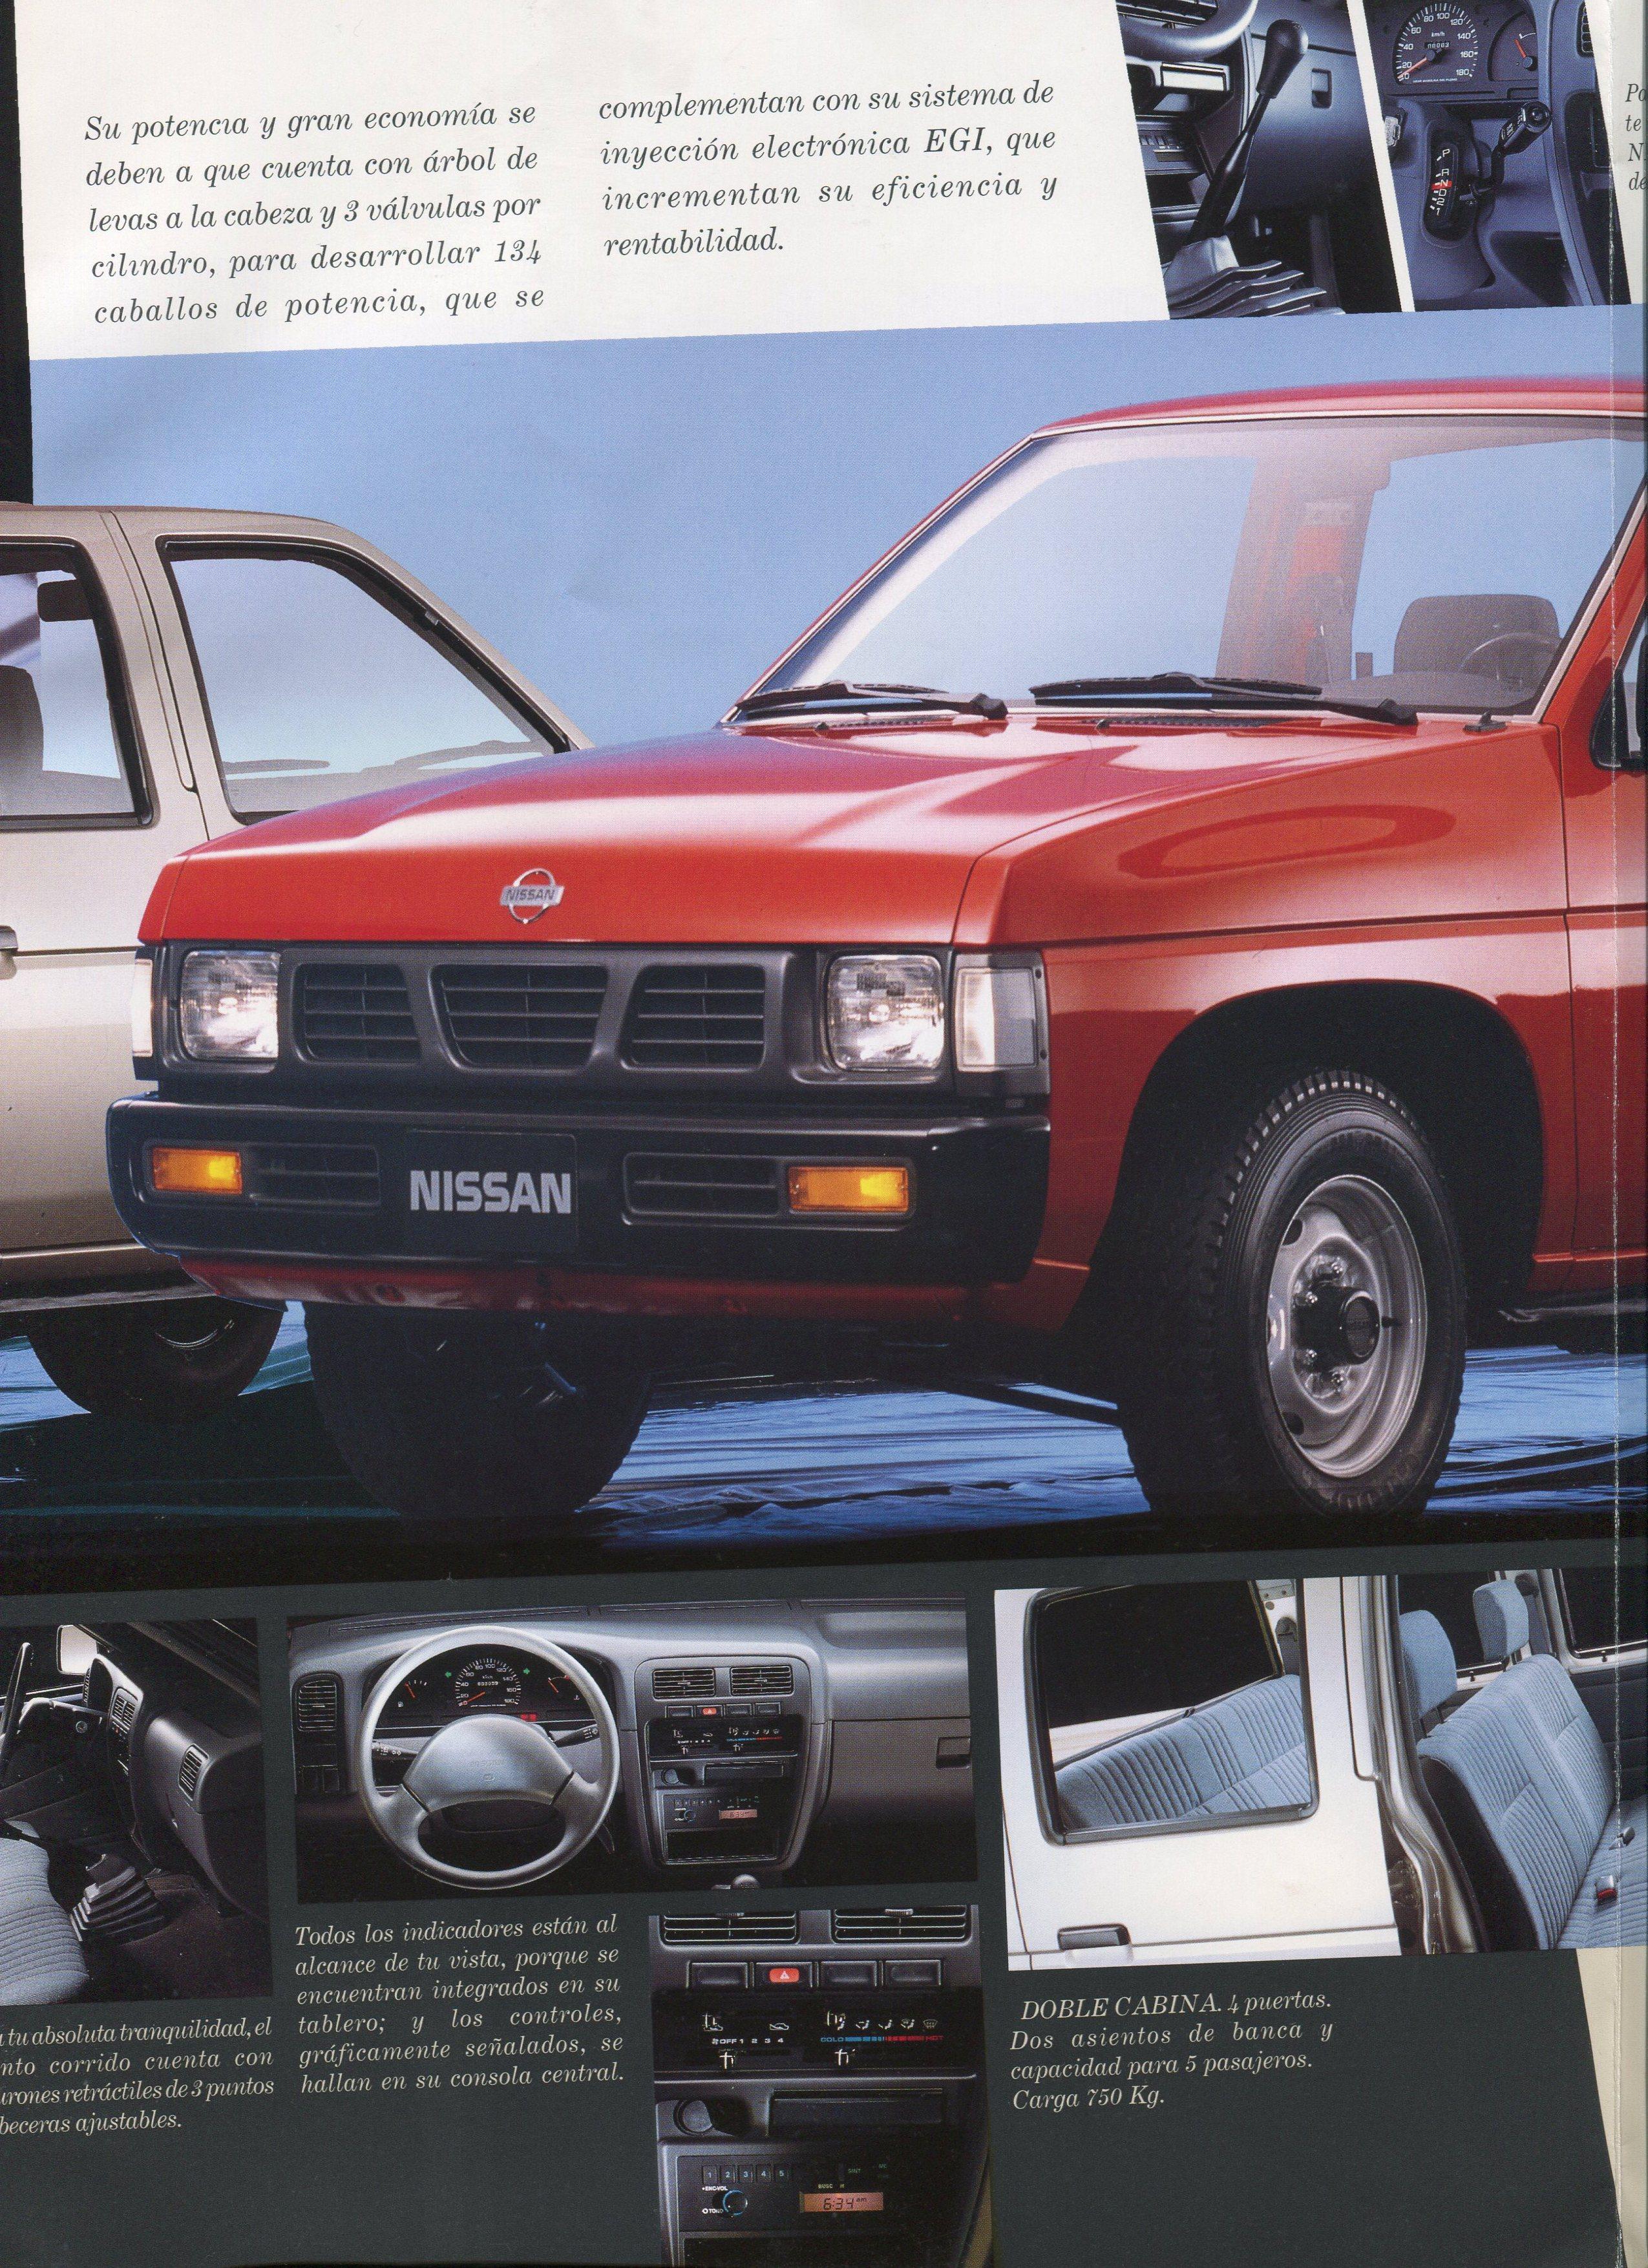 Nissan D21 Hardbody Pickup Dealer Brochure For Mexico